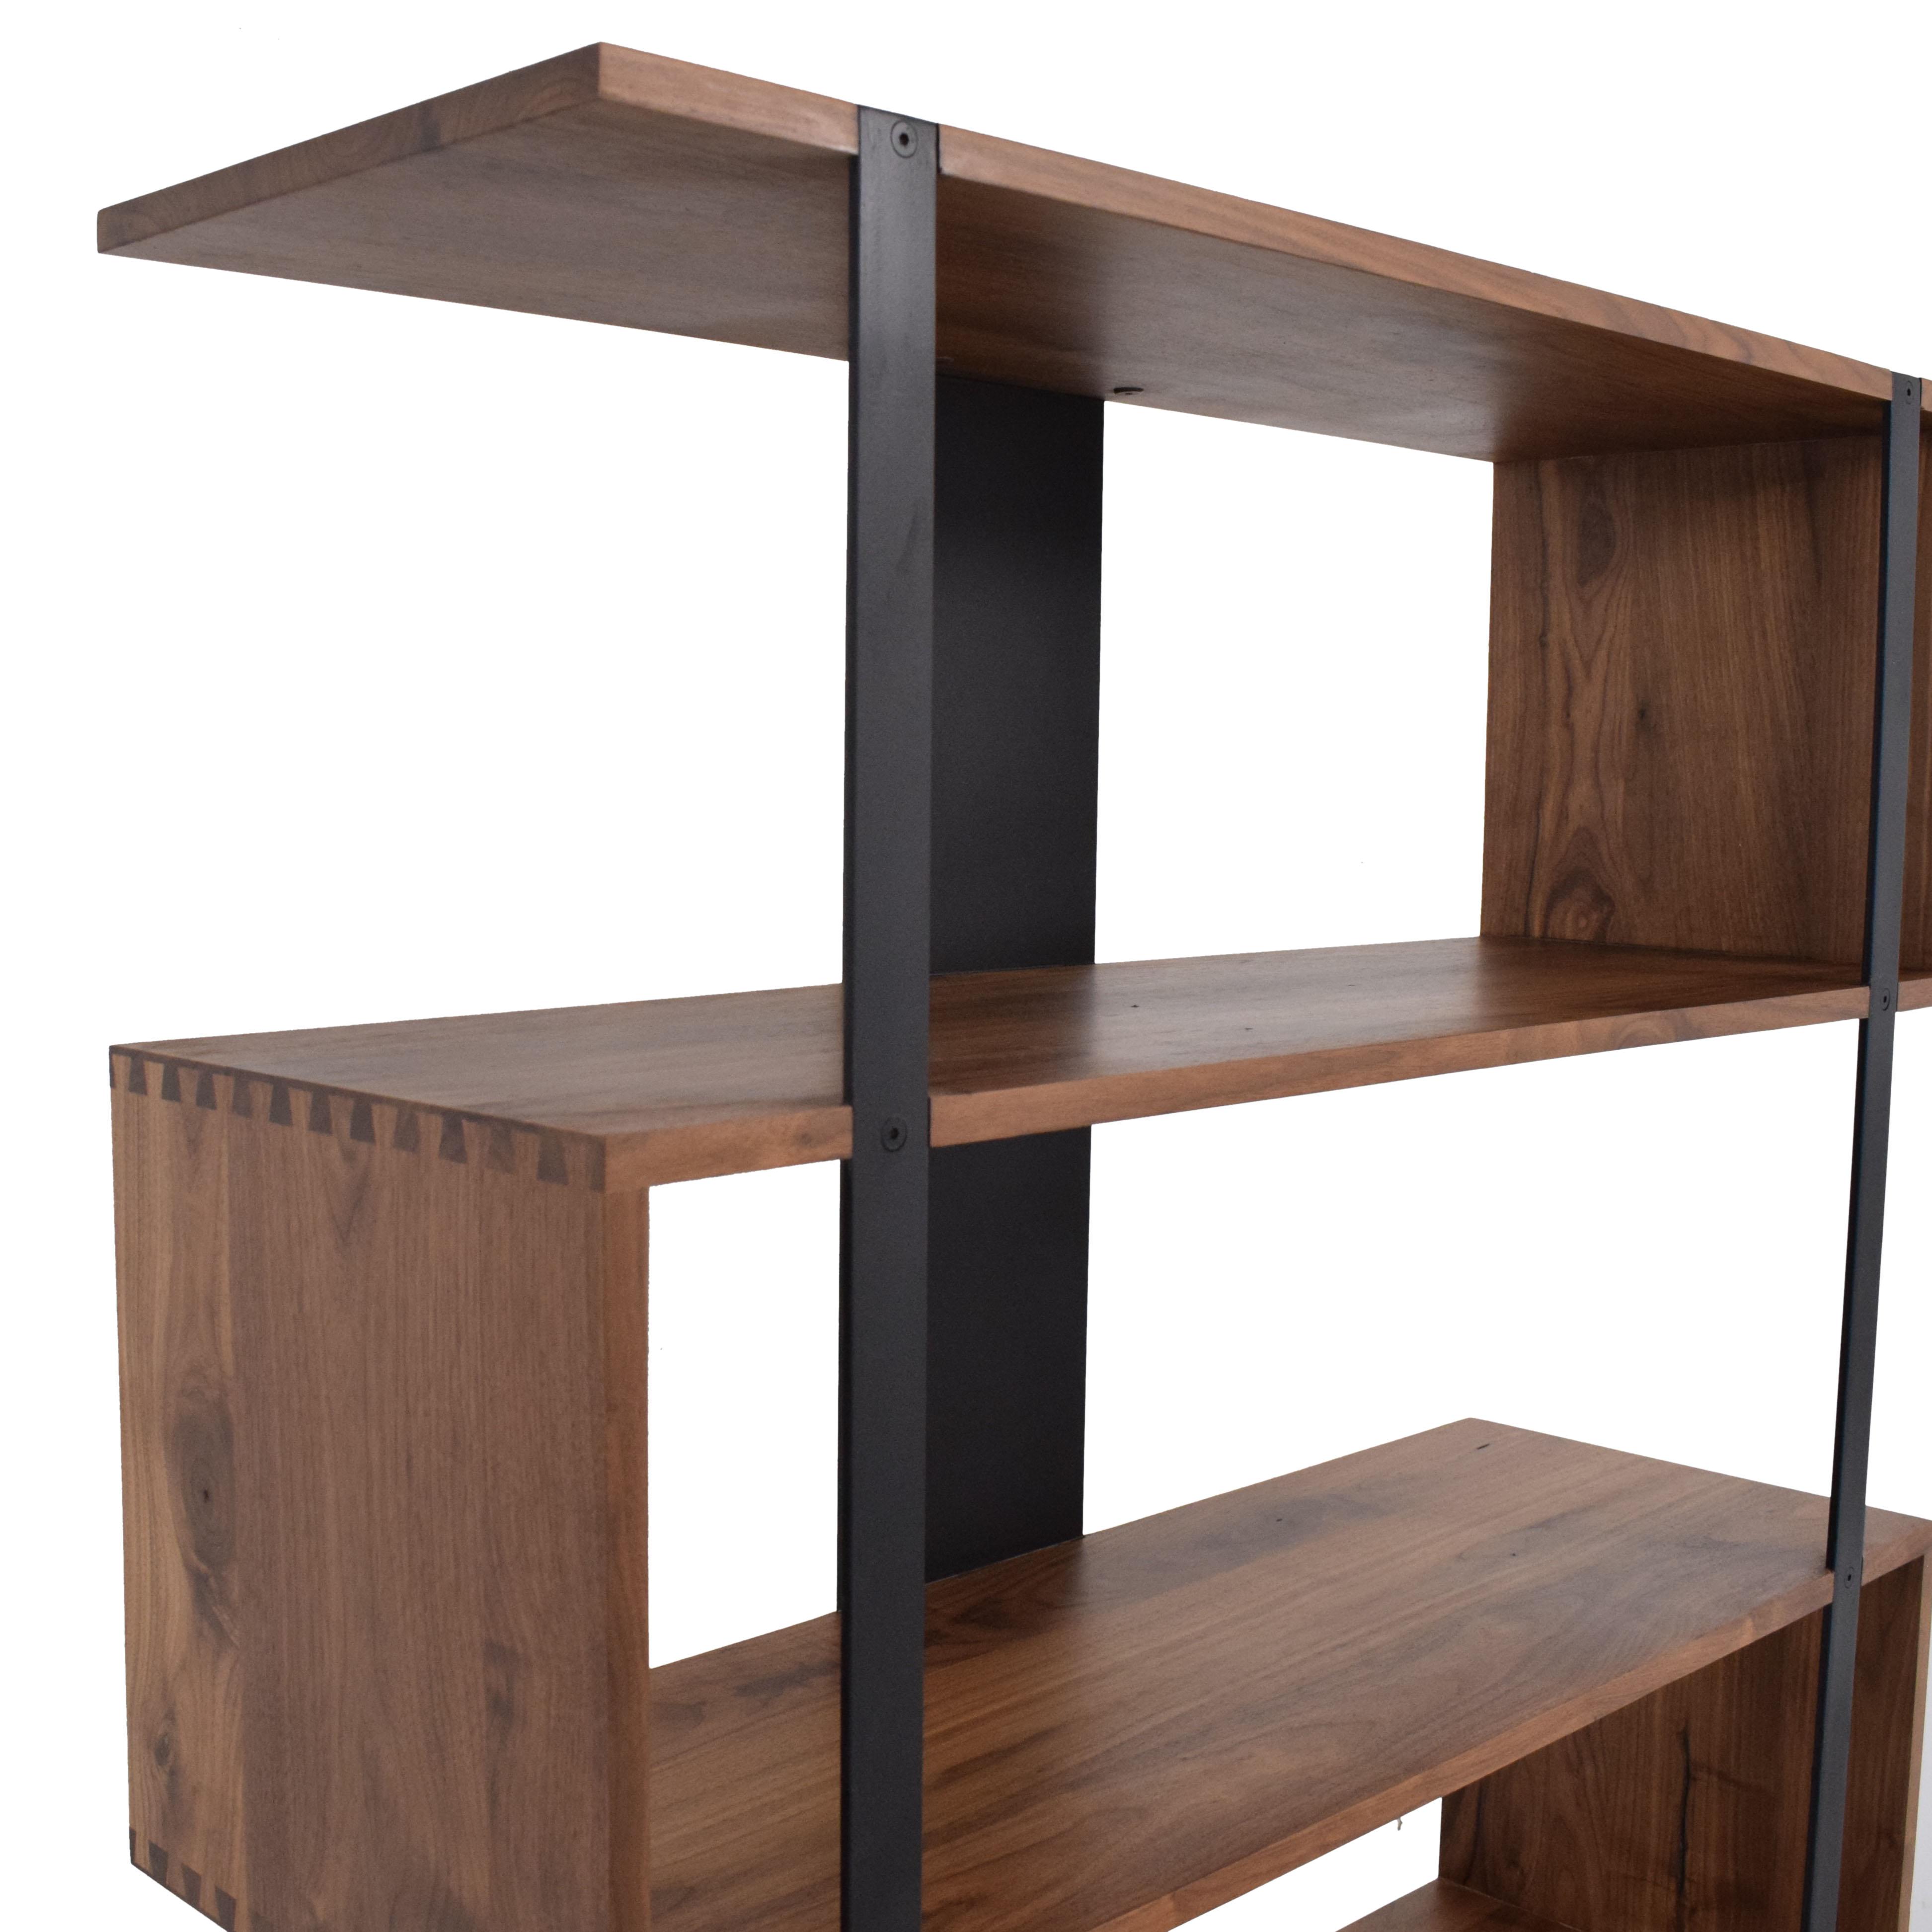 Crate & Barrel Crate & Barrel Austin Room Divider Storage